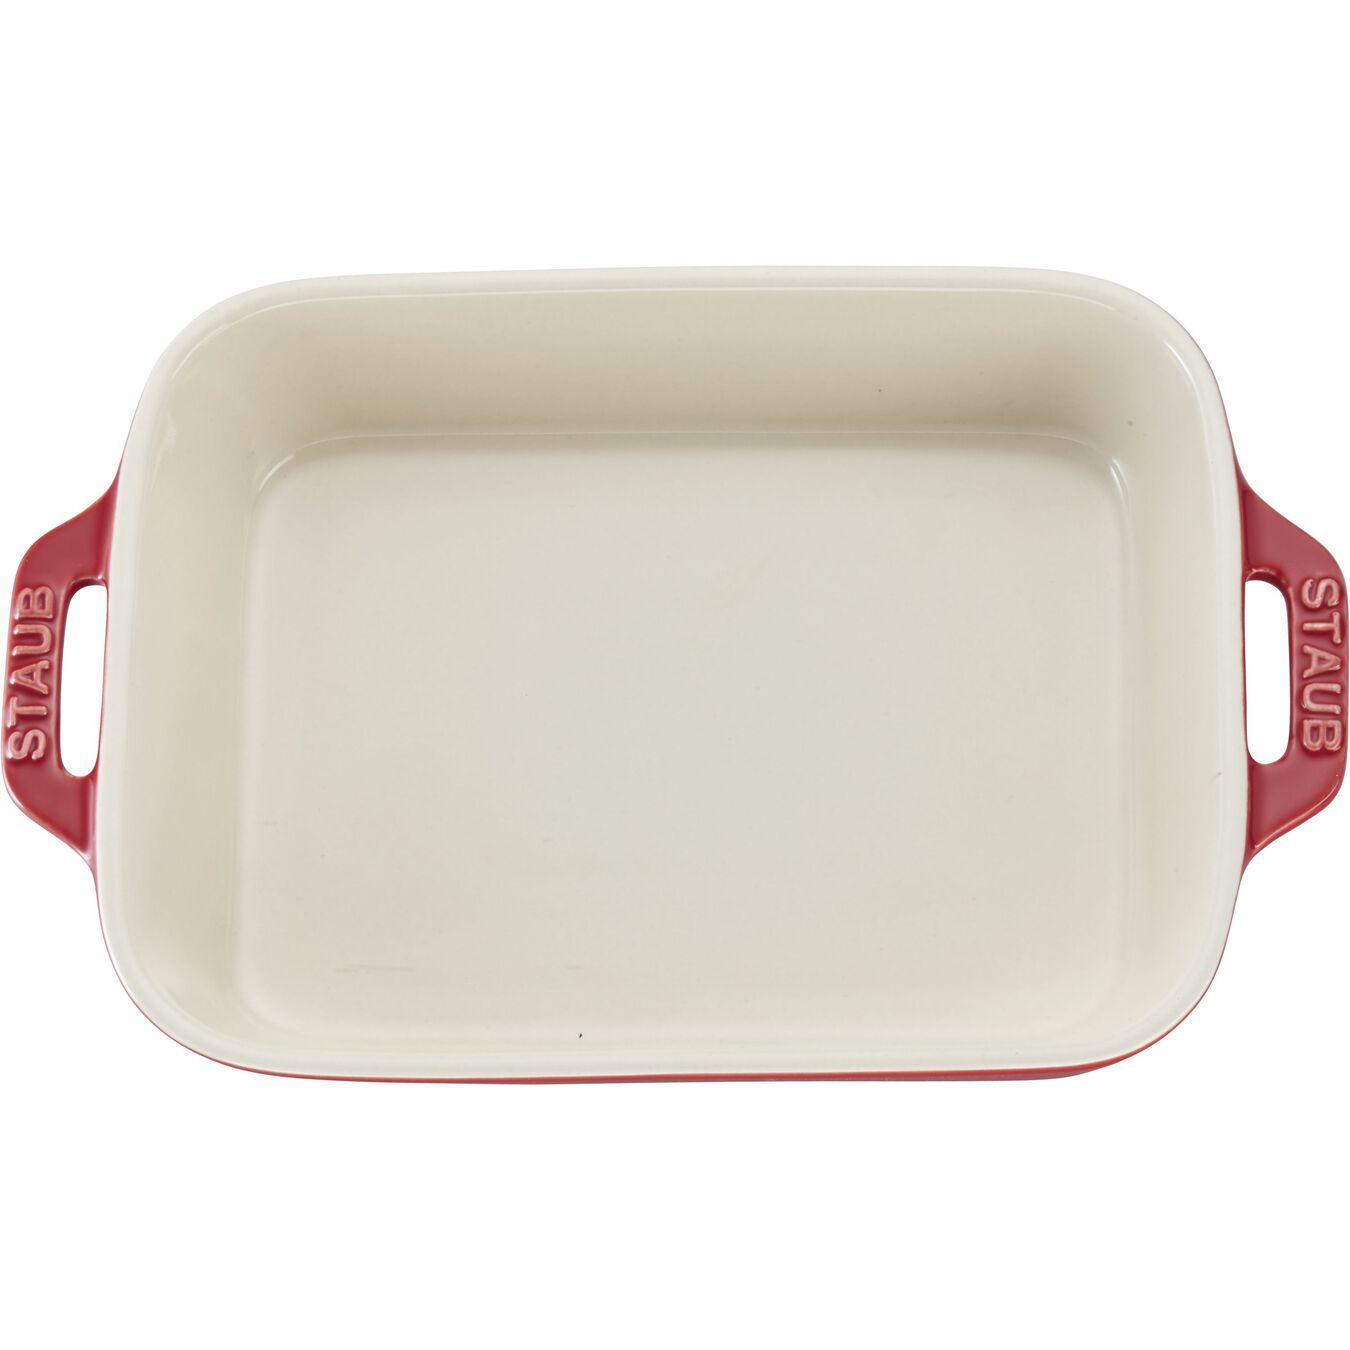 7.5-inch, rectangular, Baking Dish, cherry,,large 2